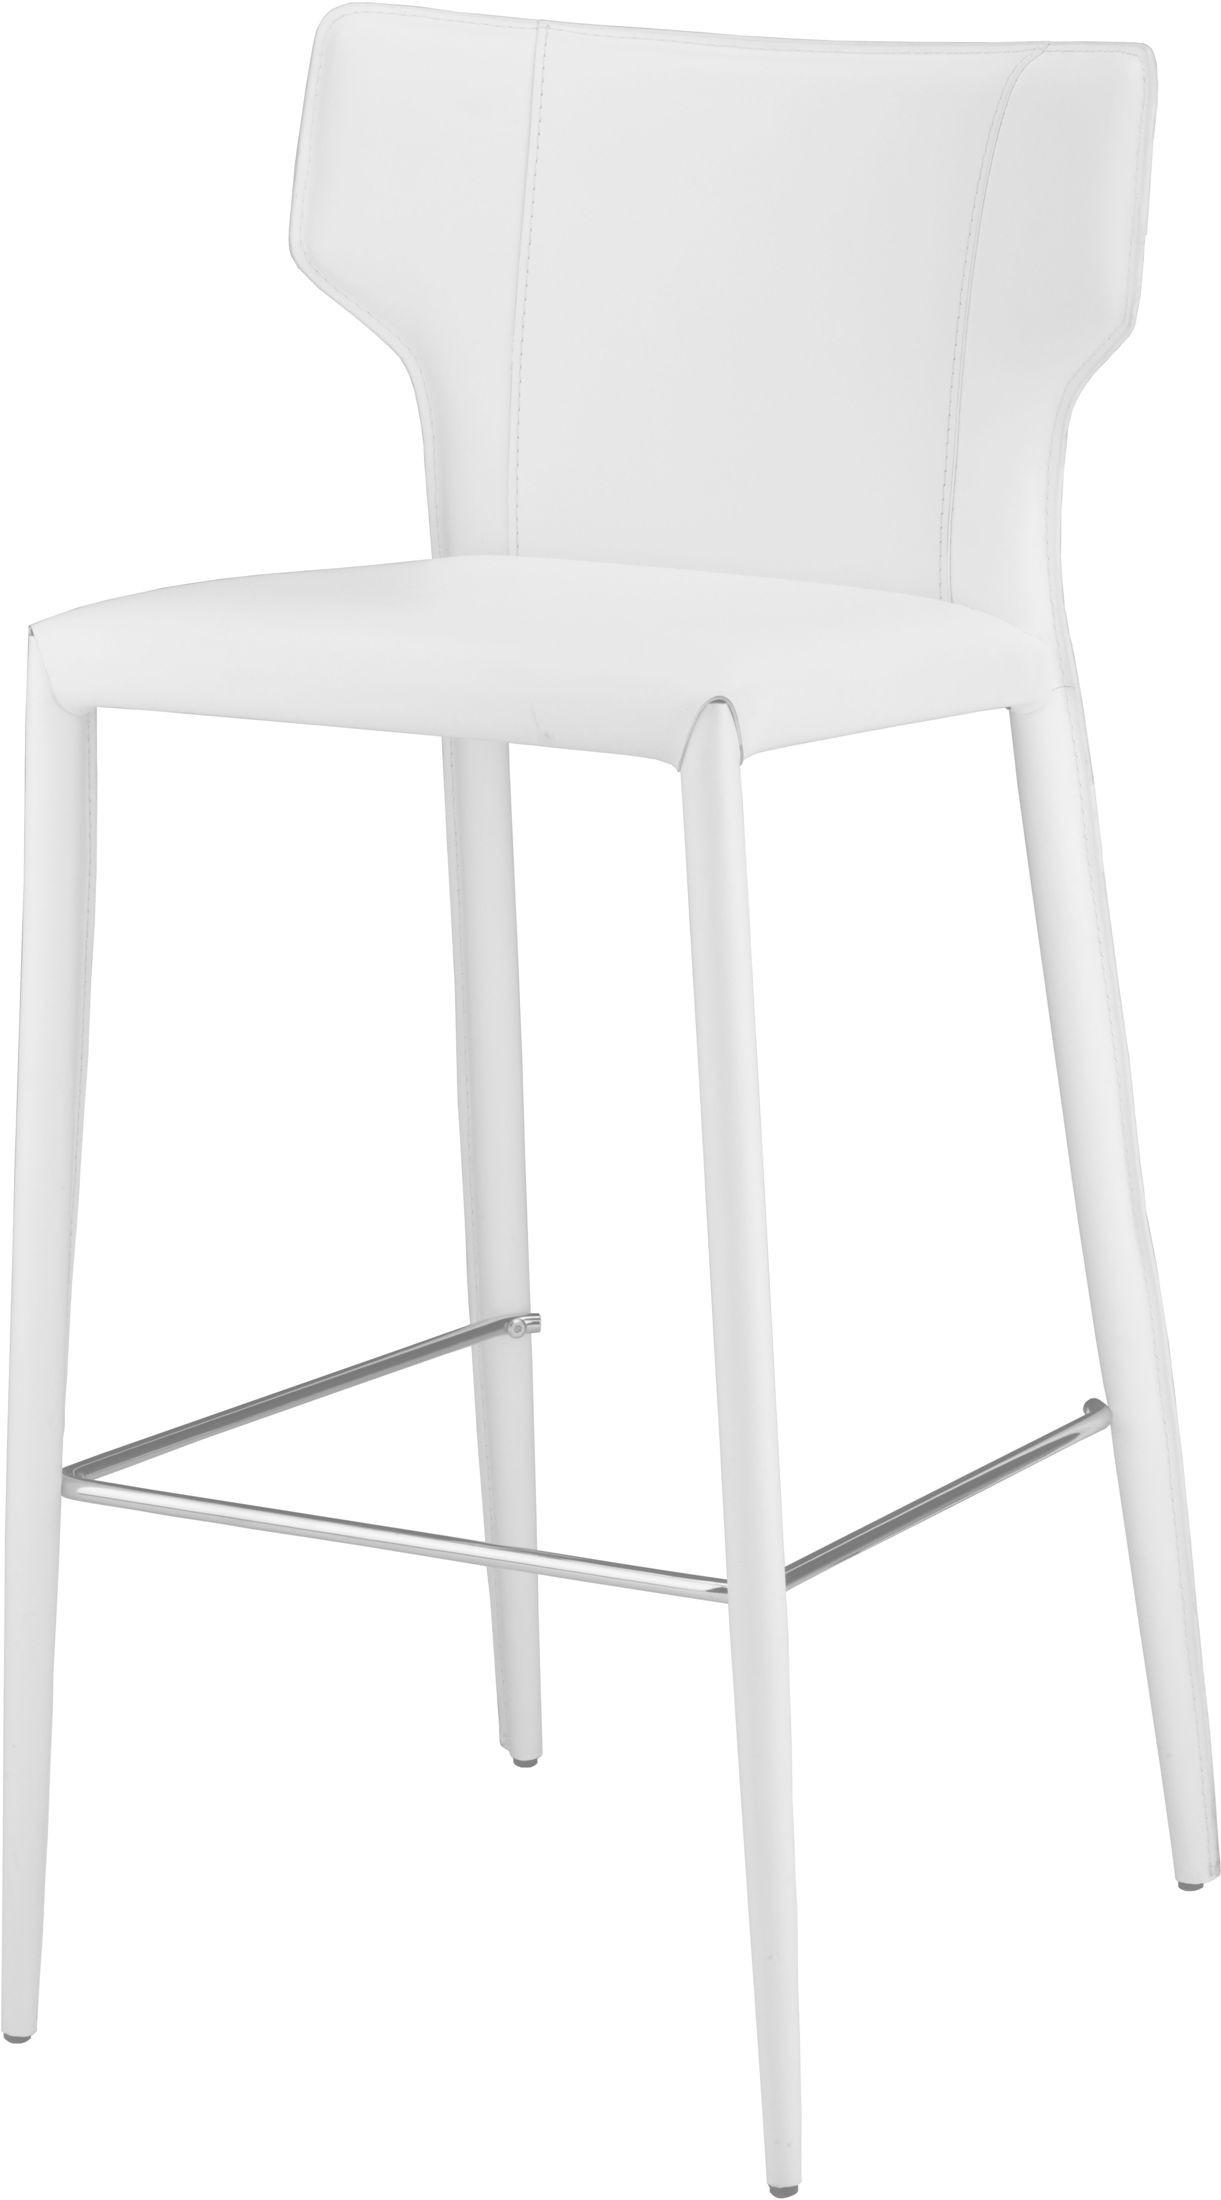 Wayne White Bar Stool Set Of 2 From Nuevo Coleman Furniture